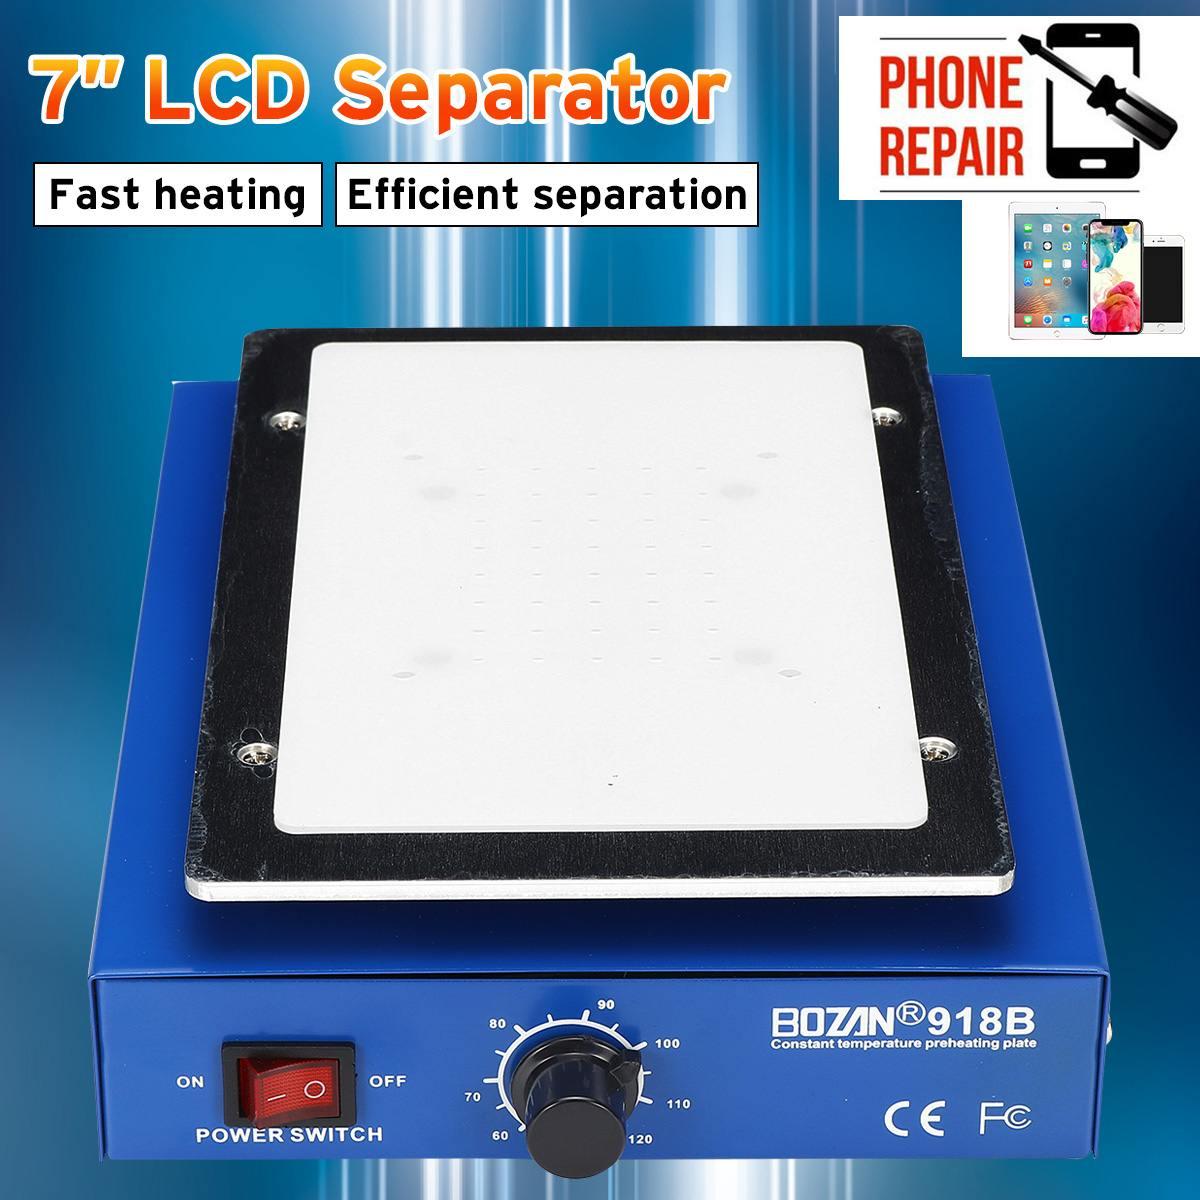 LCD Screen Separator Phone Heating Platform Plate Glass Removal Repair Machine 450W Anti Static Body Auto Heating Metal Plate